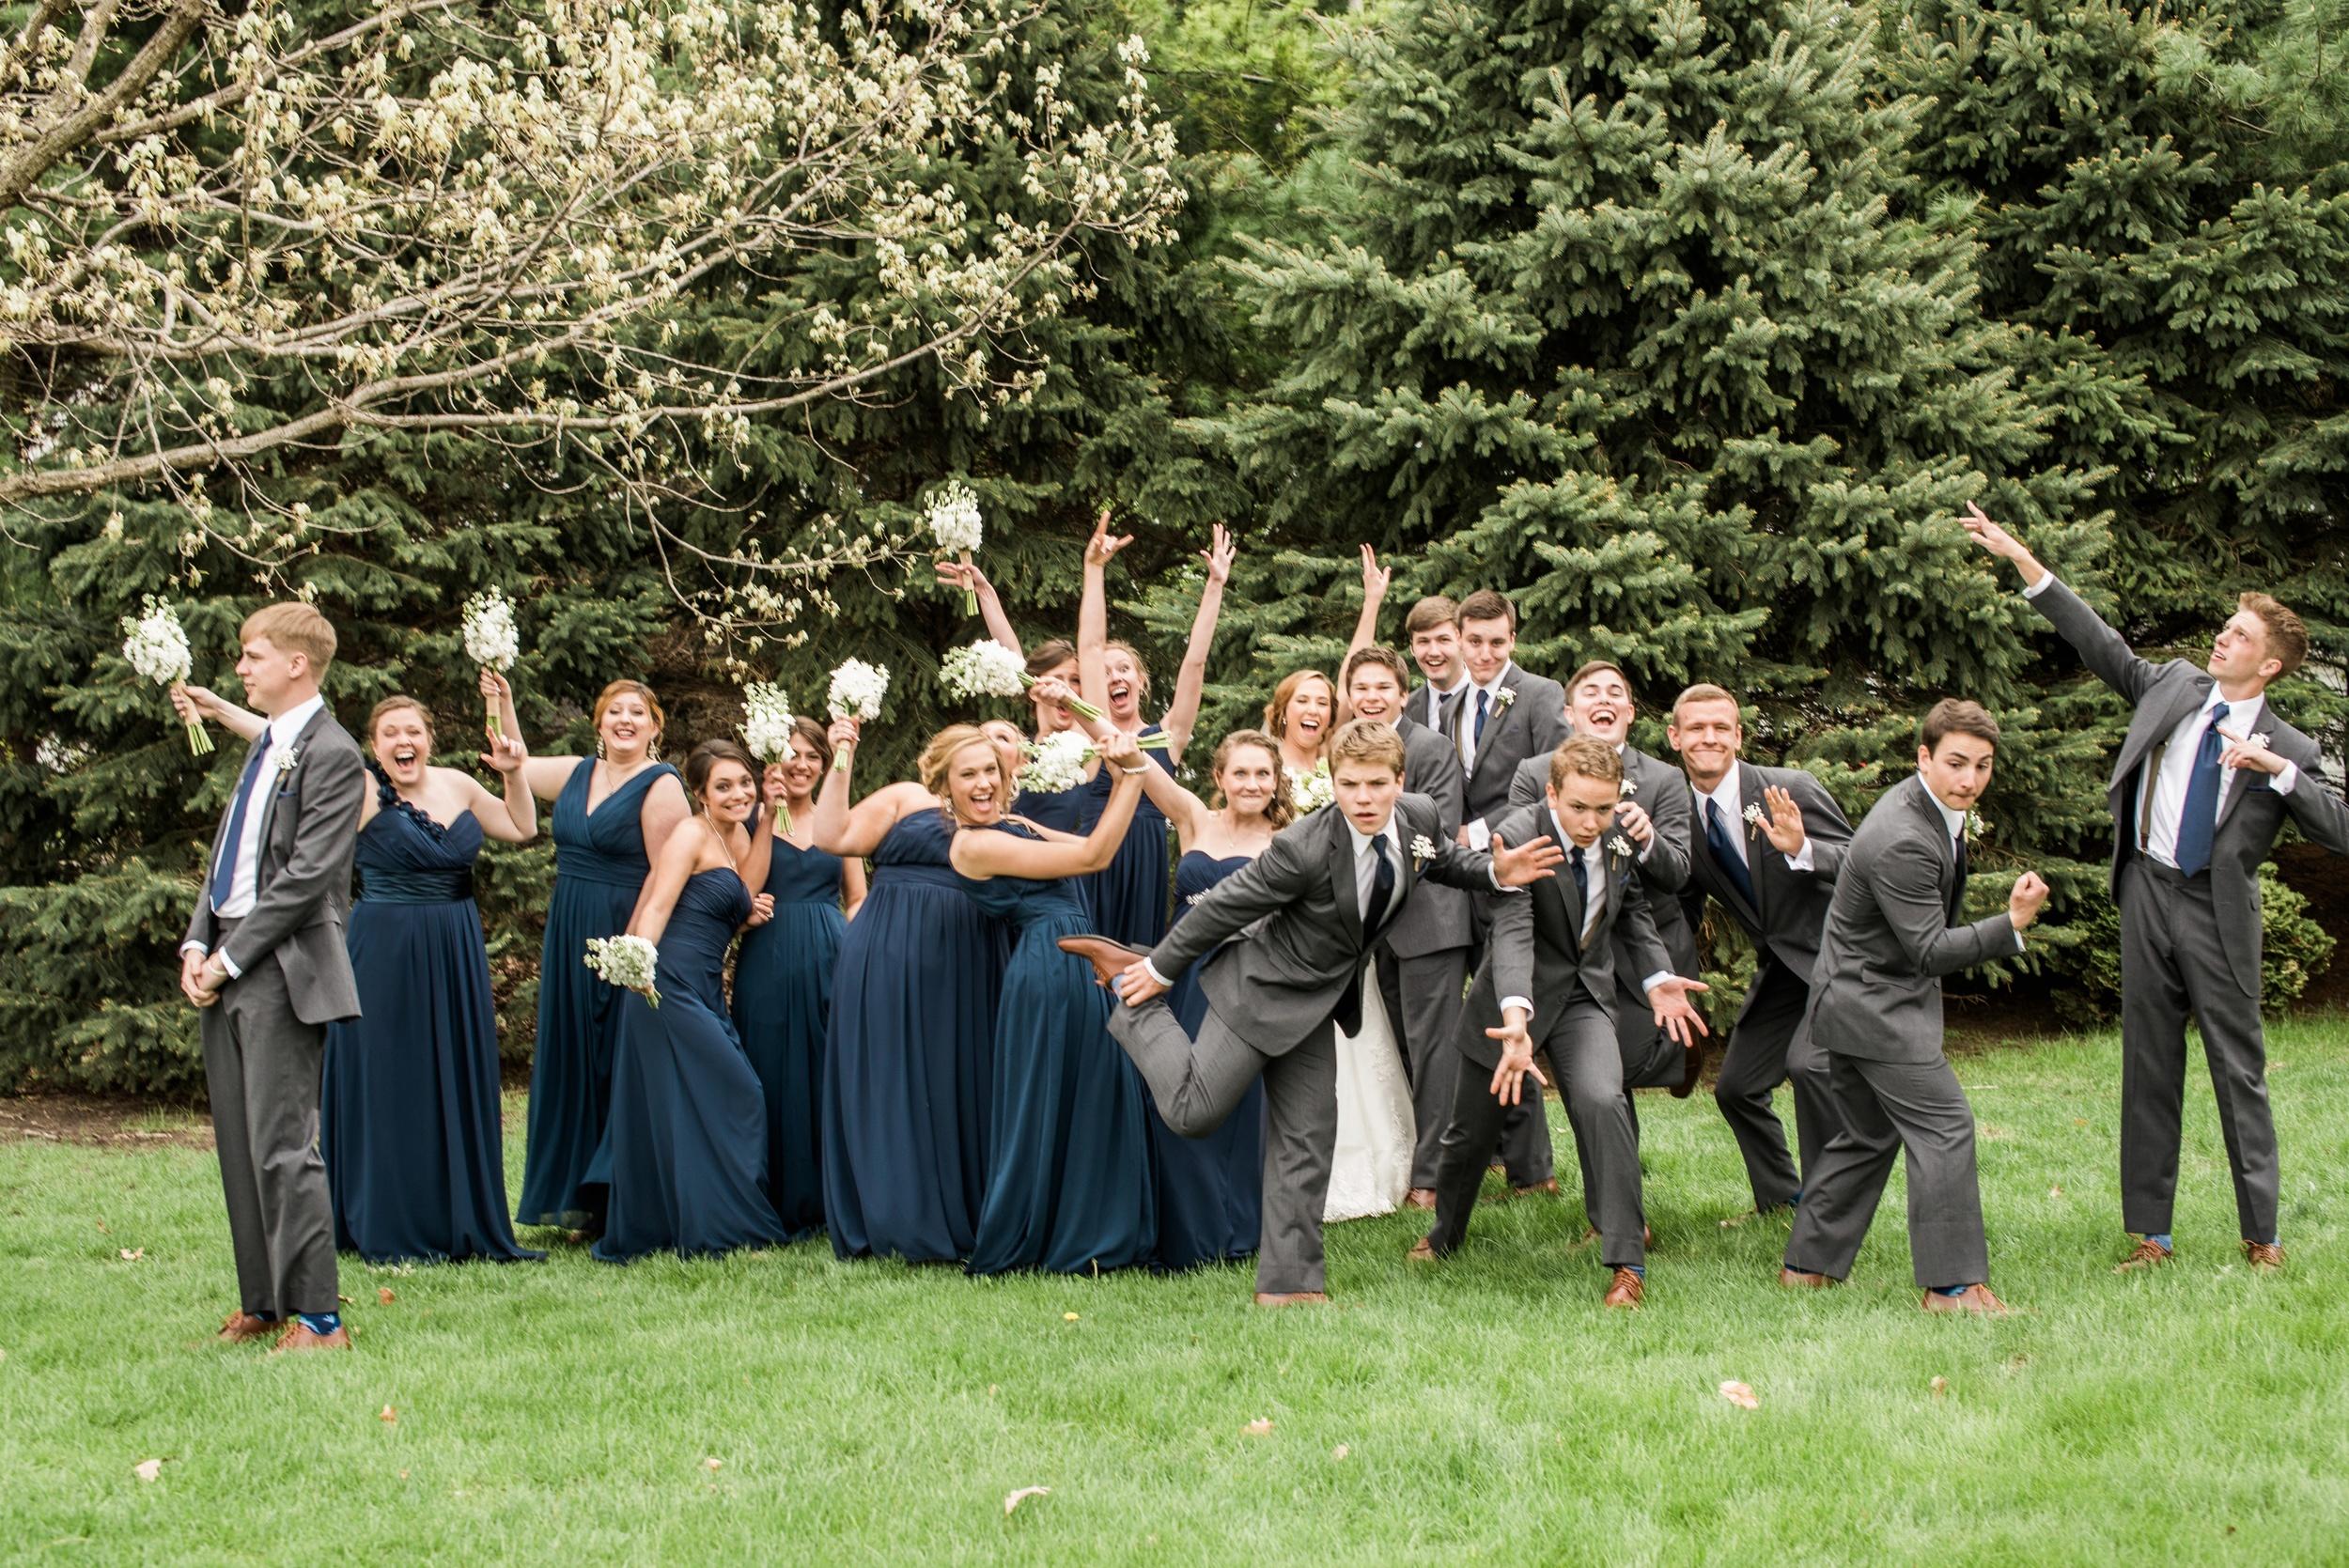 Pleasant Hill Des Moines Wedding Photographer_2159.jpg